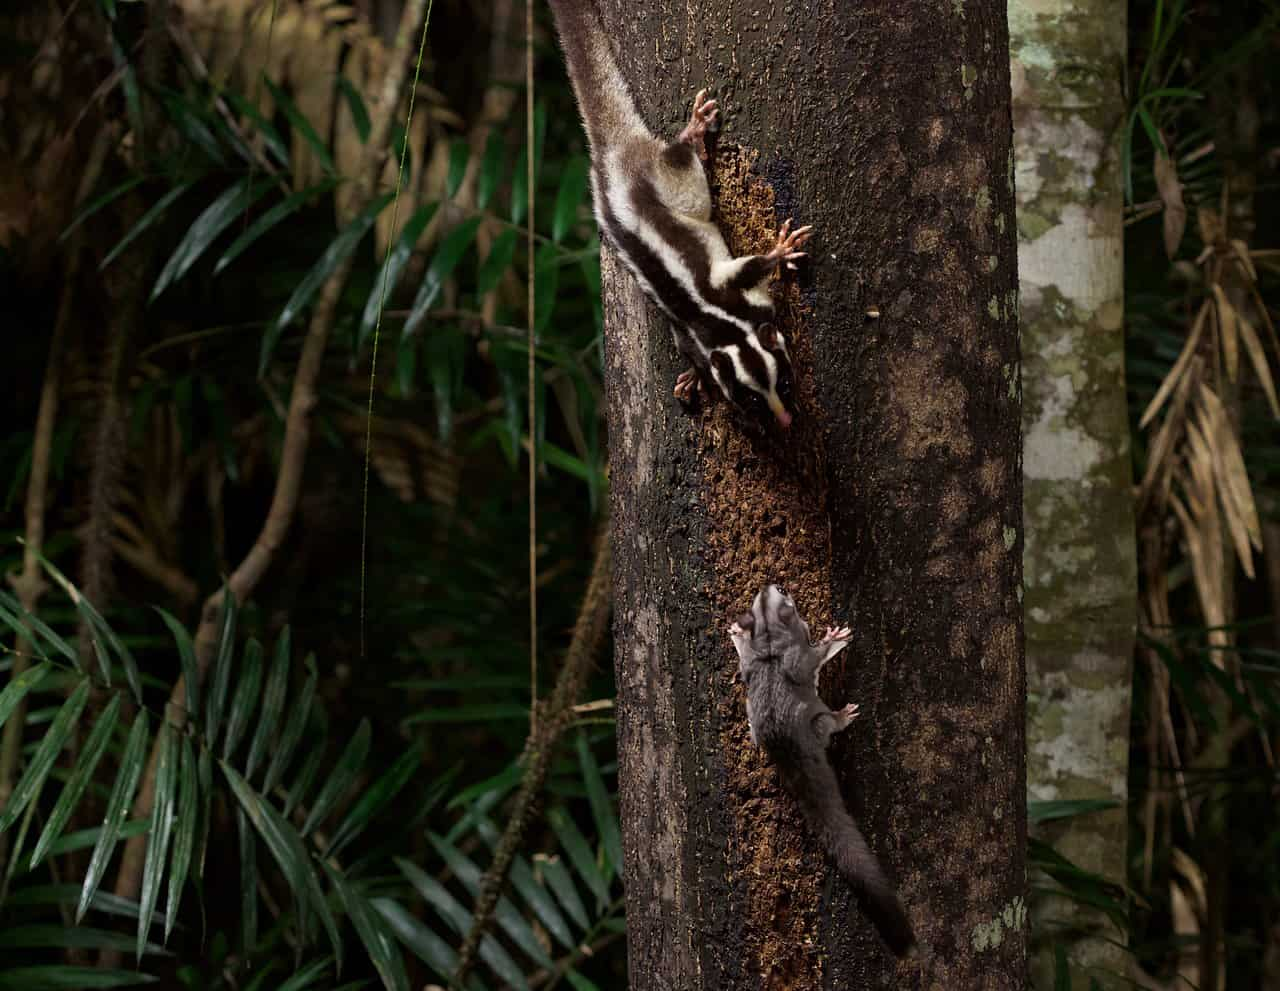 Sugar-Glider-Chambers-Wildlife-Lodge-Atherton-Tablelands-Queensland-Australia-1